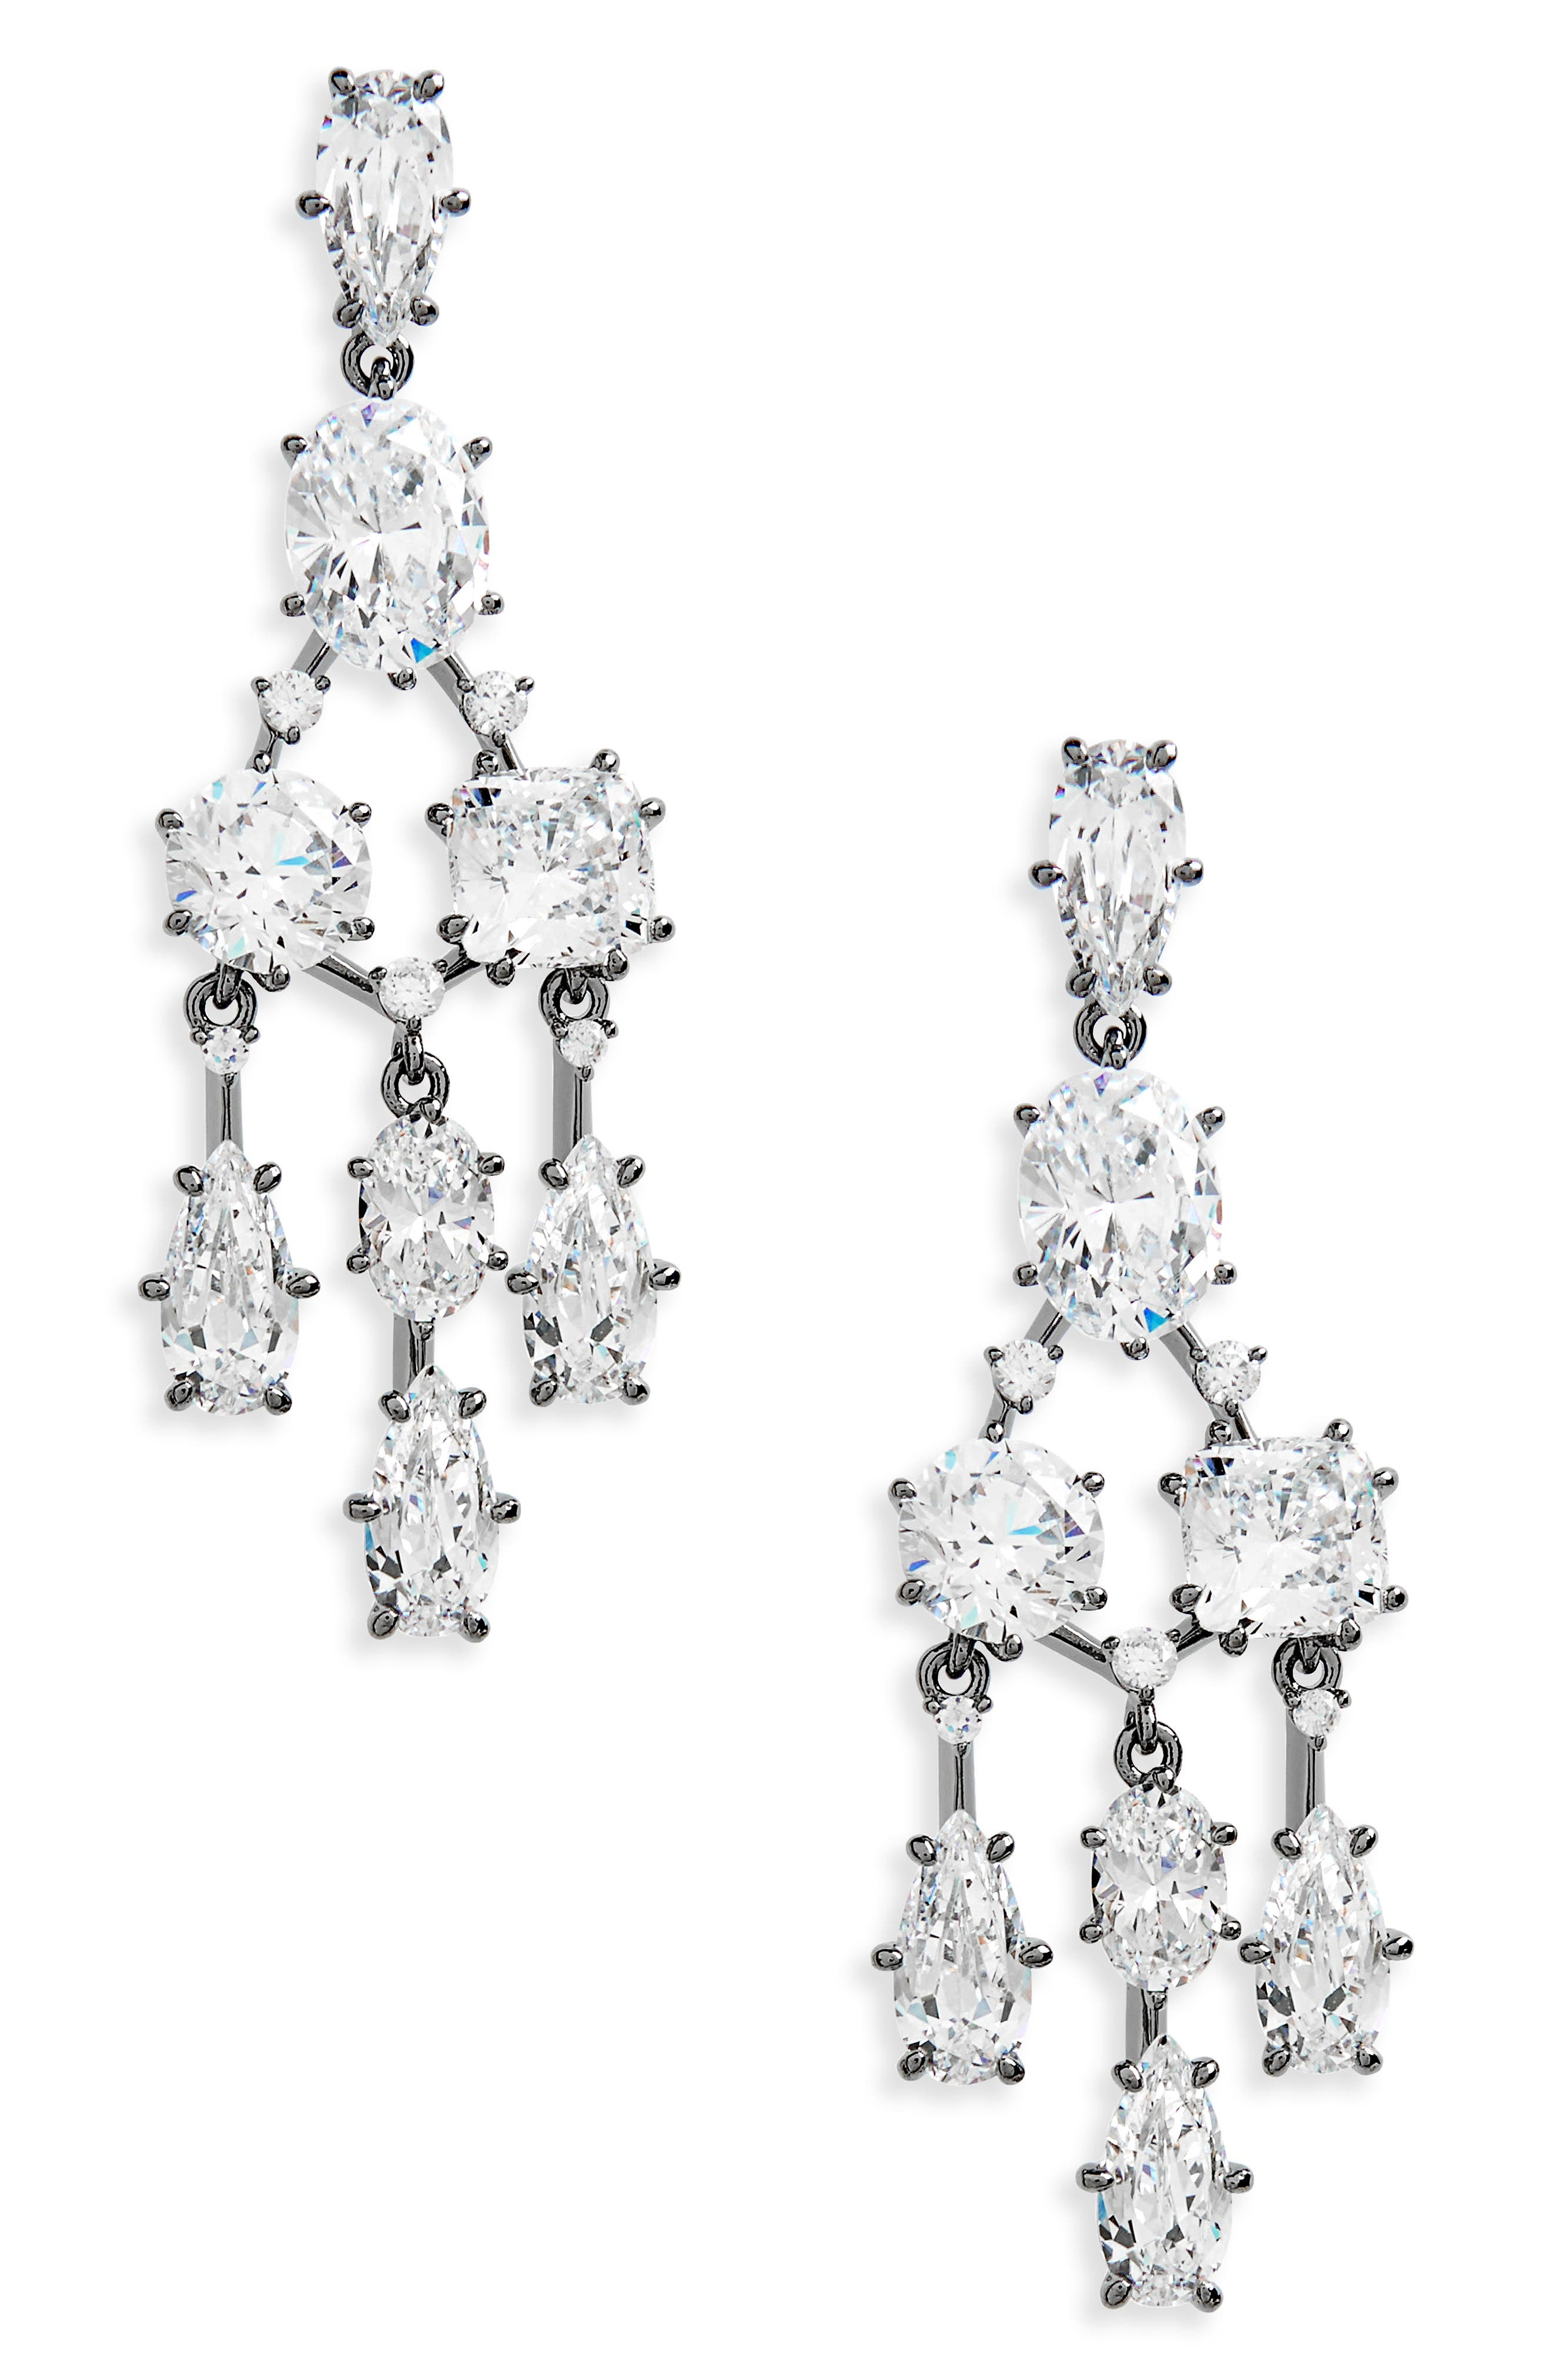 Cubic Zirconia Chandelier Earrings,                         Main,                         color, Black